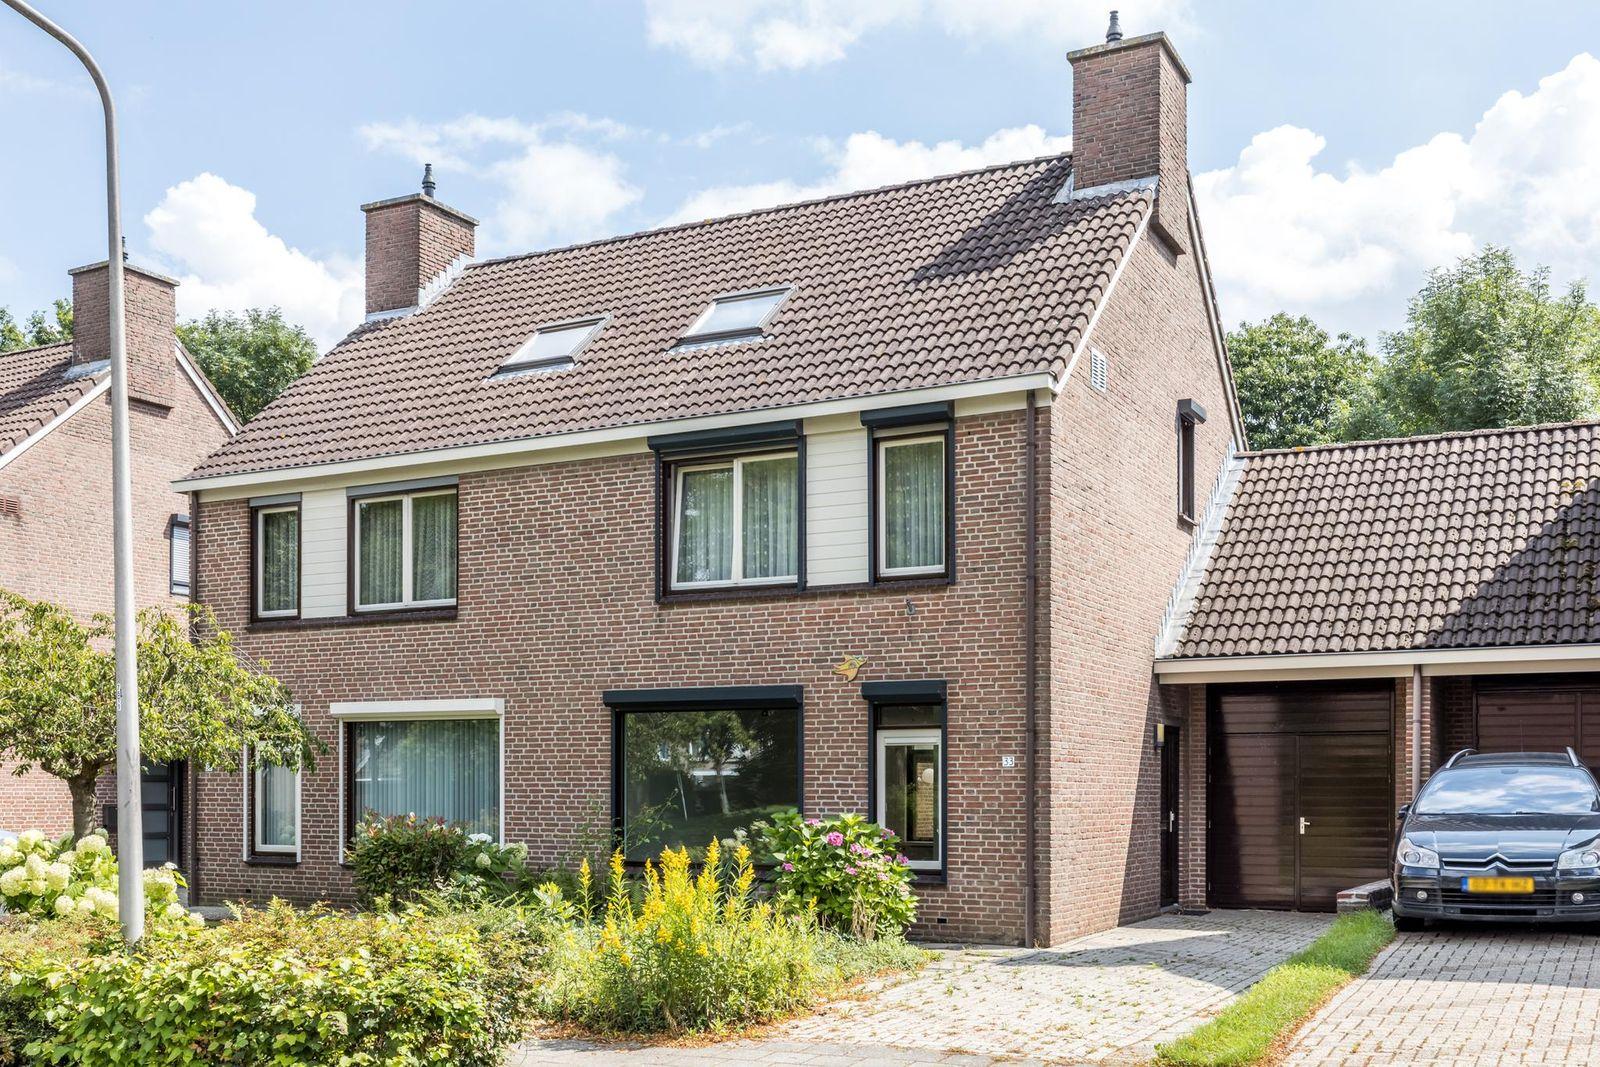 Willem van Gelre-Gulikstraat 33, Sittard